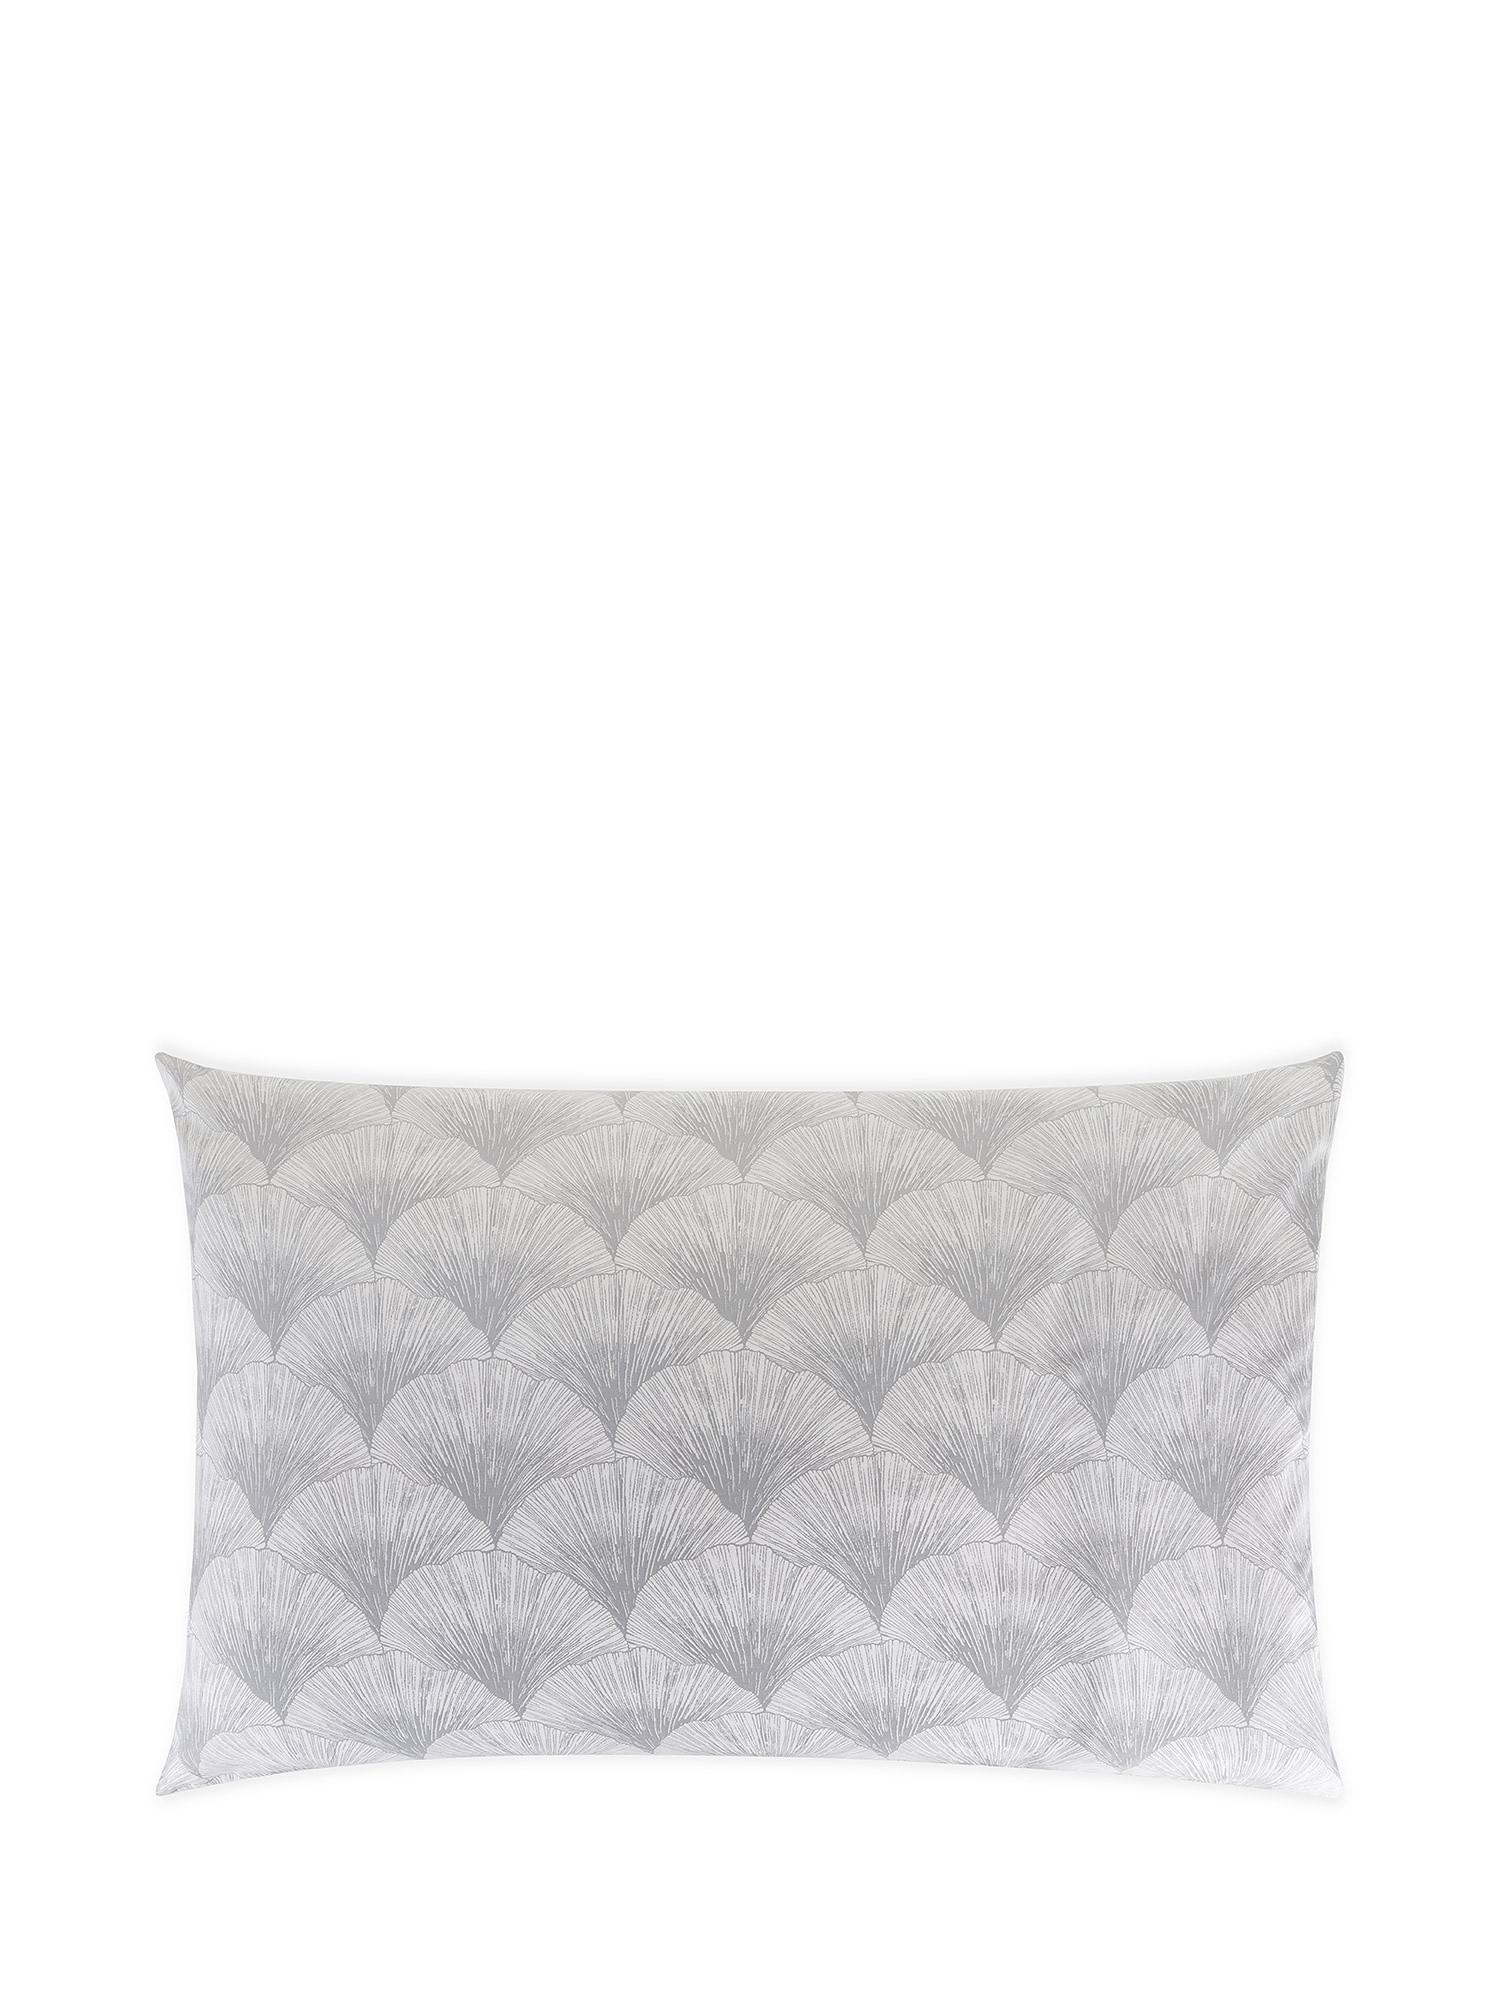 Federa raso di cotone fantasia Ginkgo, Bianco, large image number 0